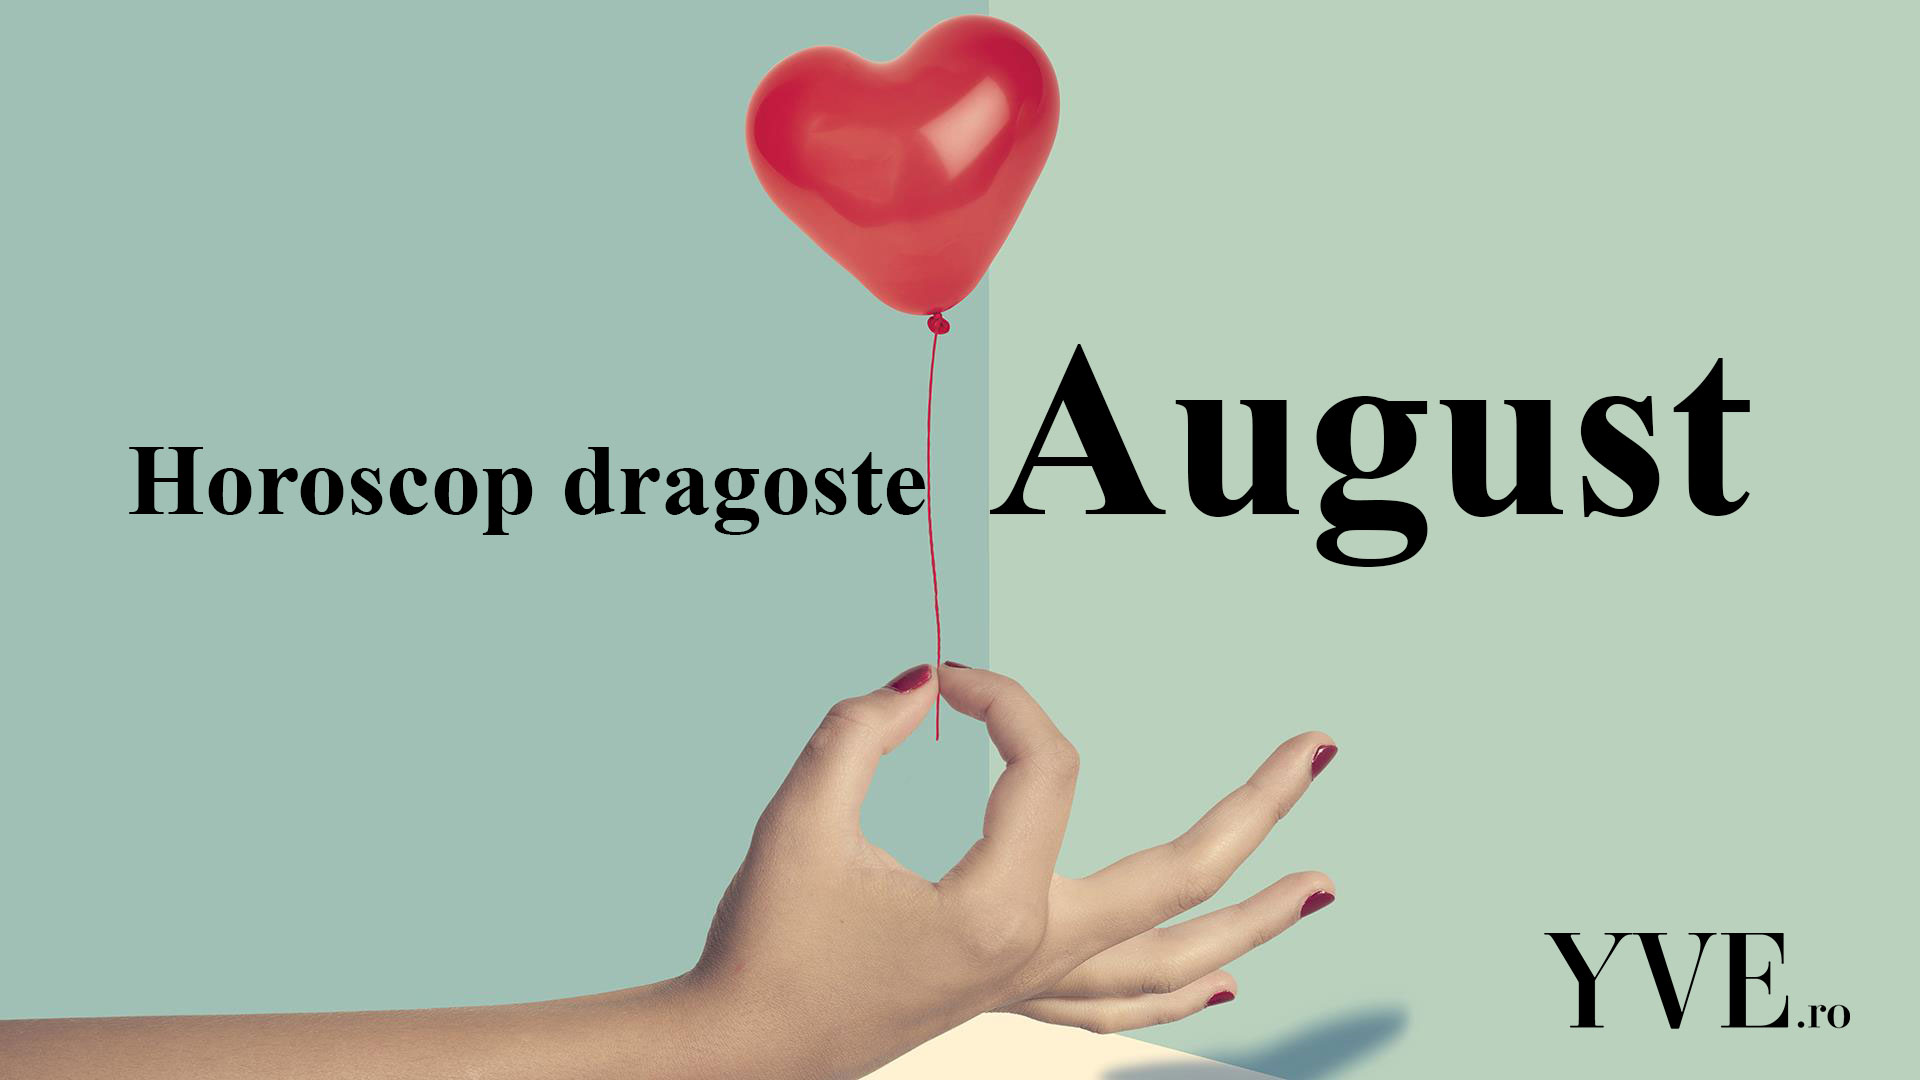 Horoscop dragoste August